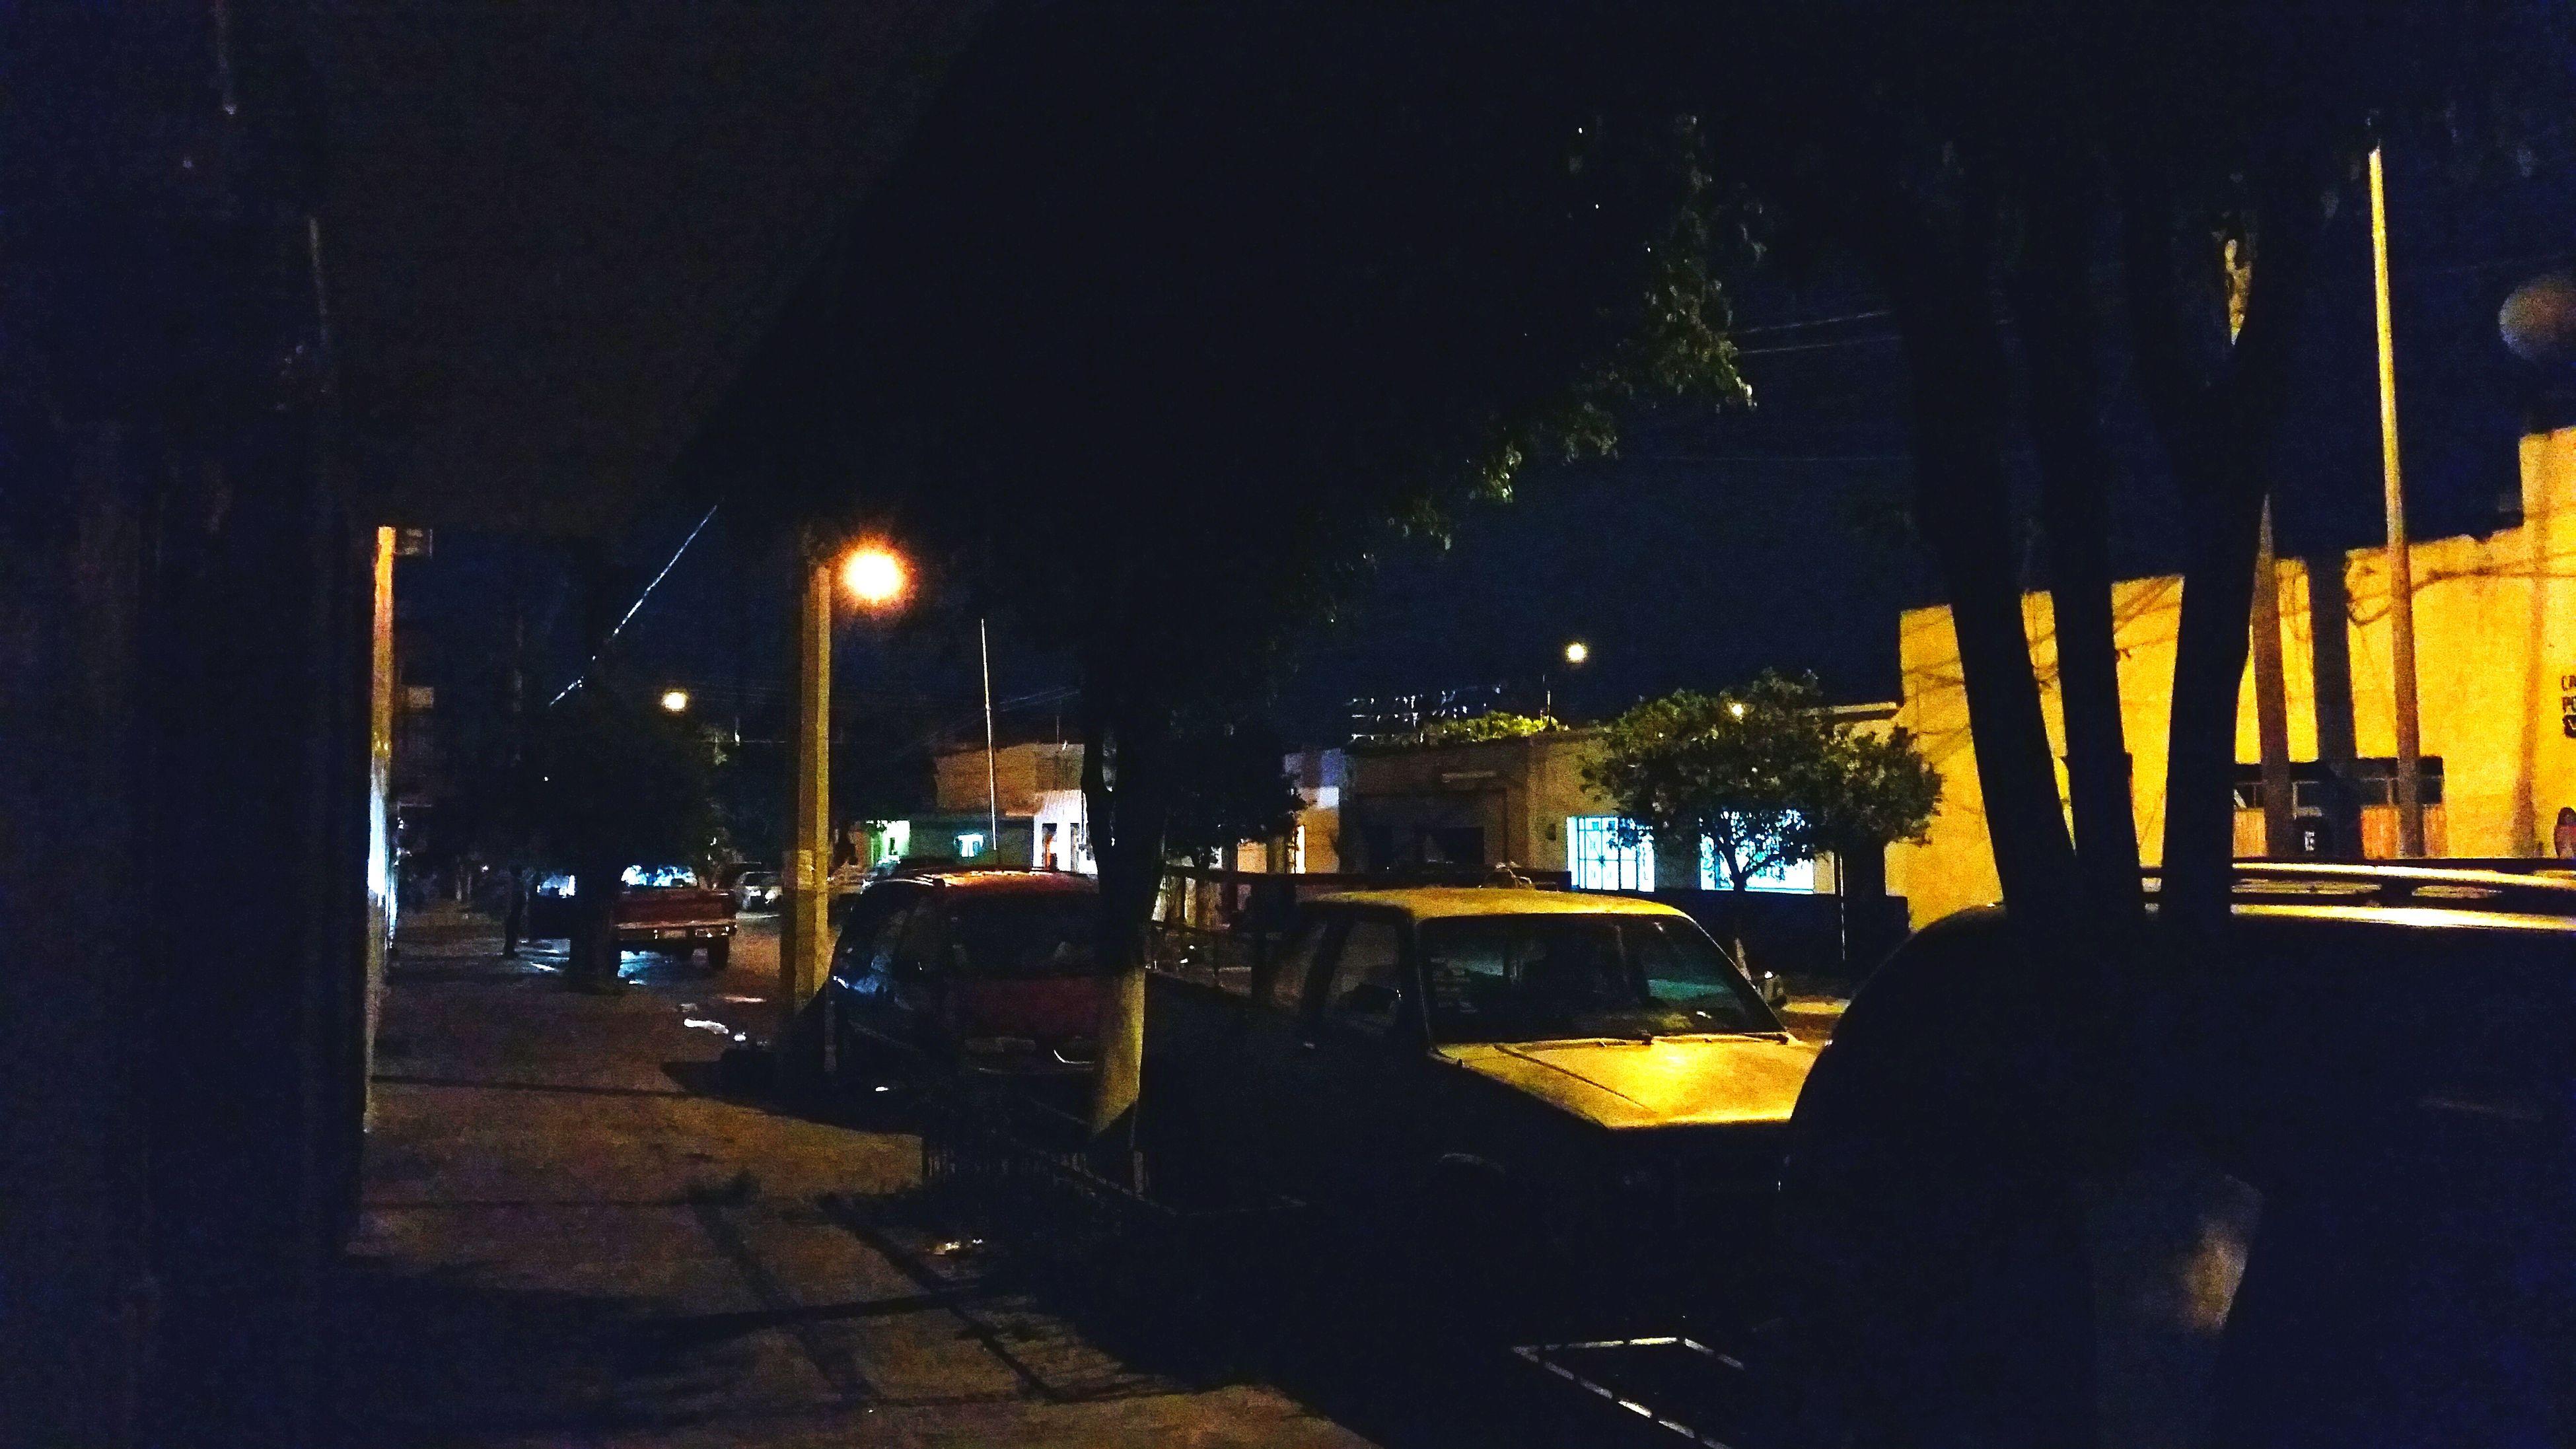 night, illuminated, street light, building exterior, built structure, architecture, city, street, lighting equipment, dark, empty, transportation, light - natural phenomenon, absence, outdoors, road, no people, car, shadow, sky